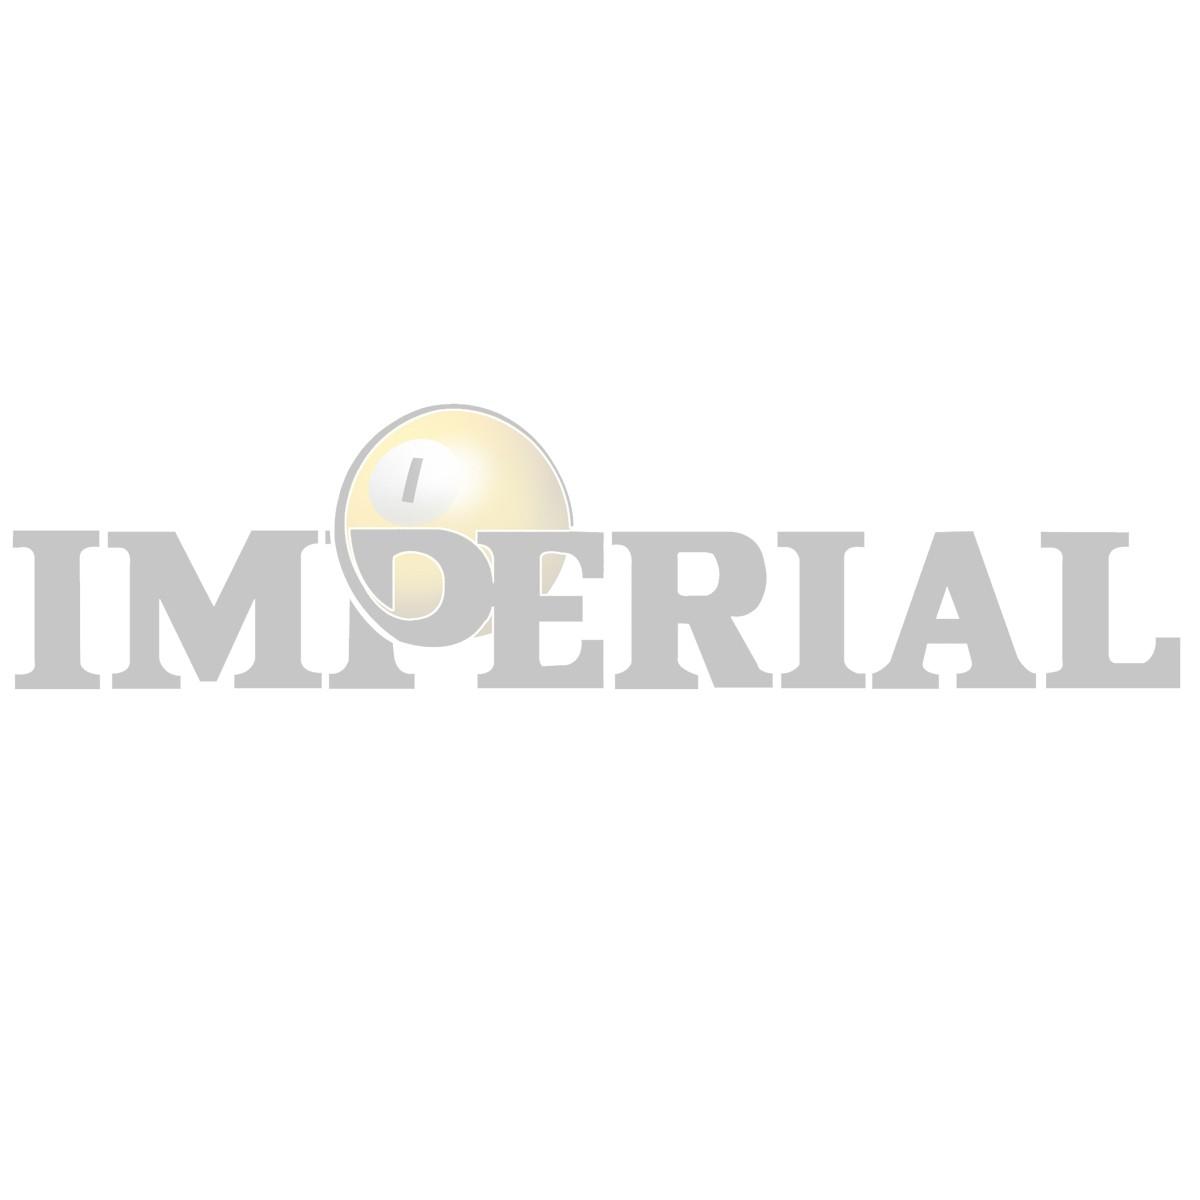 Green Bay Packers 9-foot Billiard Cloth